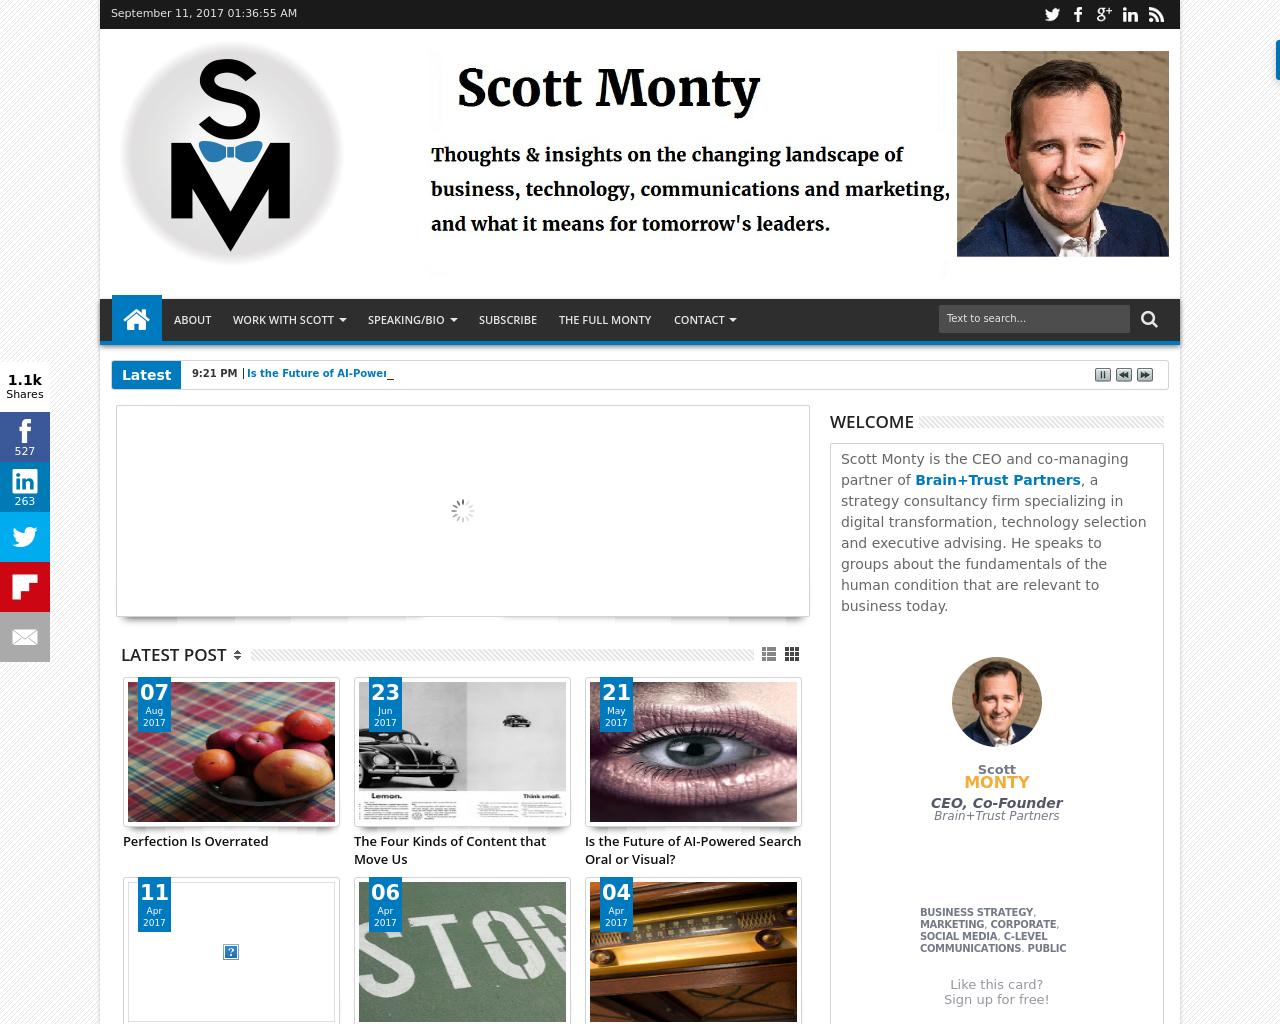 Scott-Monty-Advertising-Reviews-Pricing